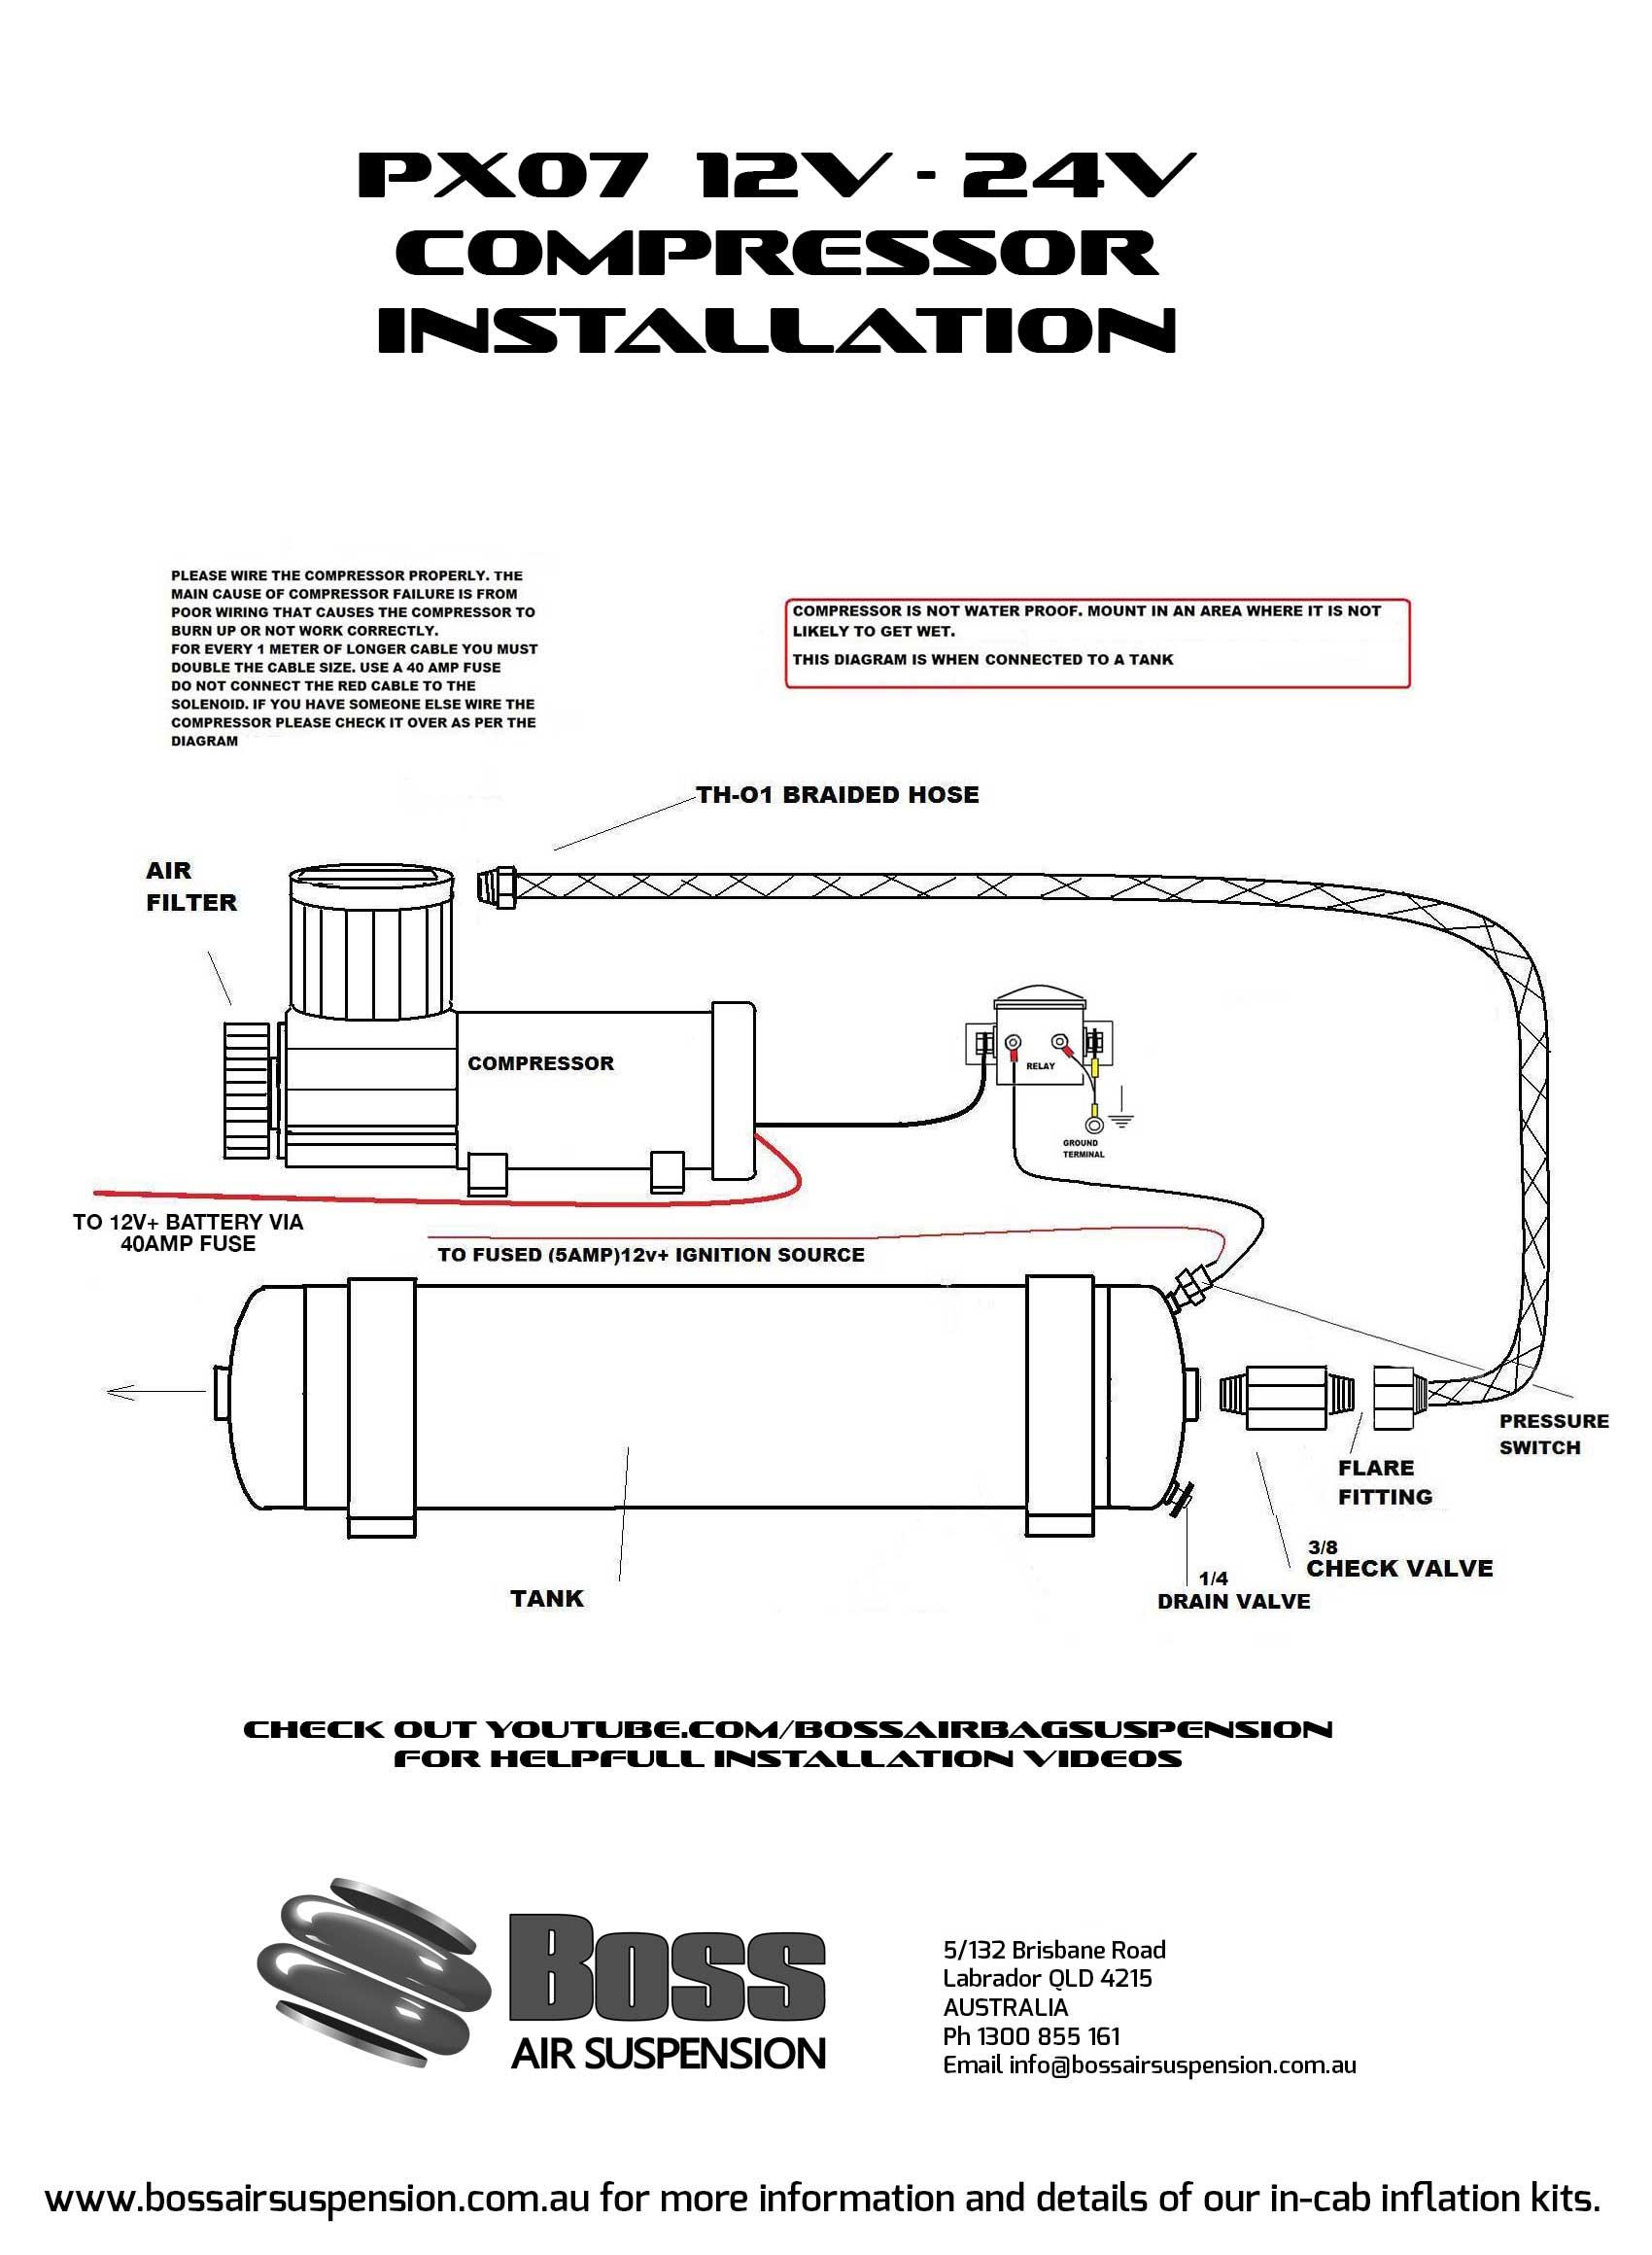 12 volt horn wiring diagram free picture 12 volt air horn wiring diagram schematic wiring diagram data  12 volt air horn wiring diagram